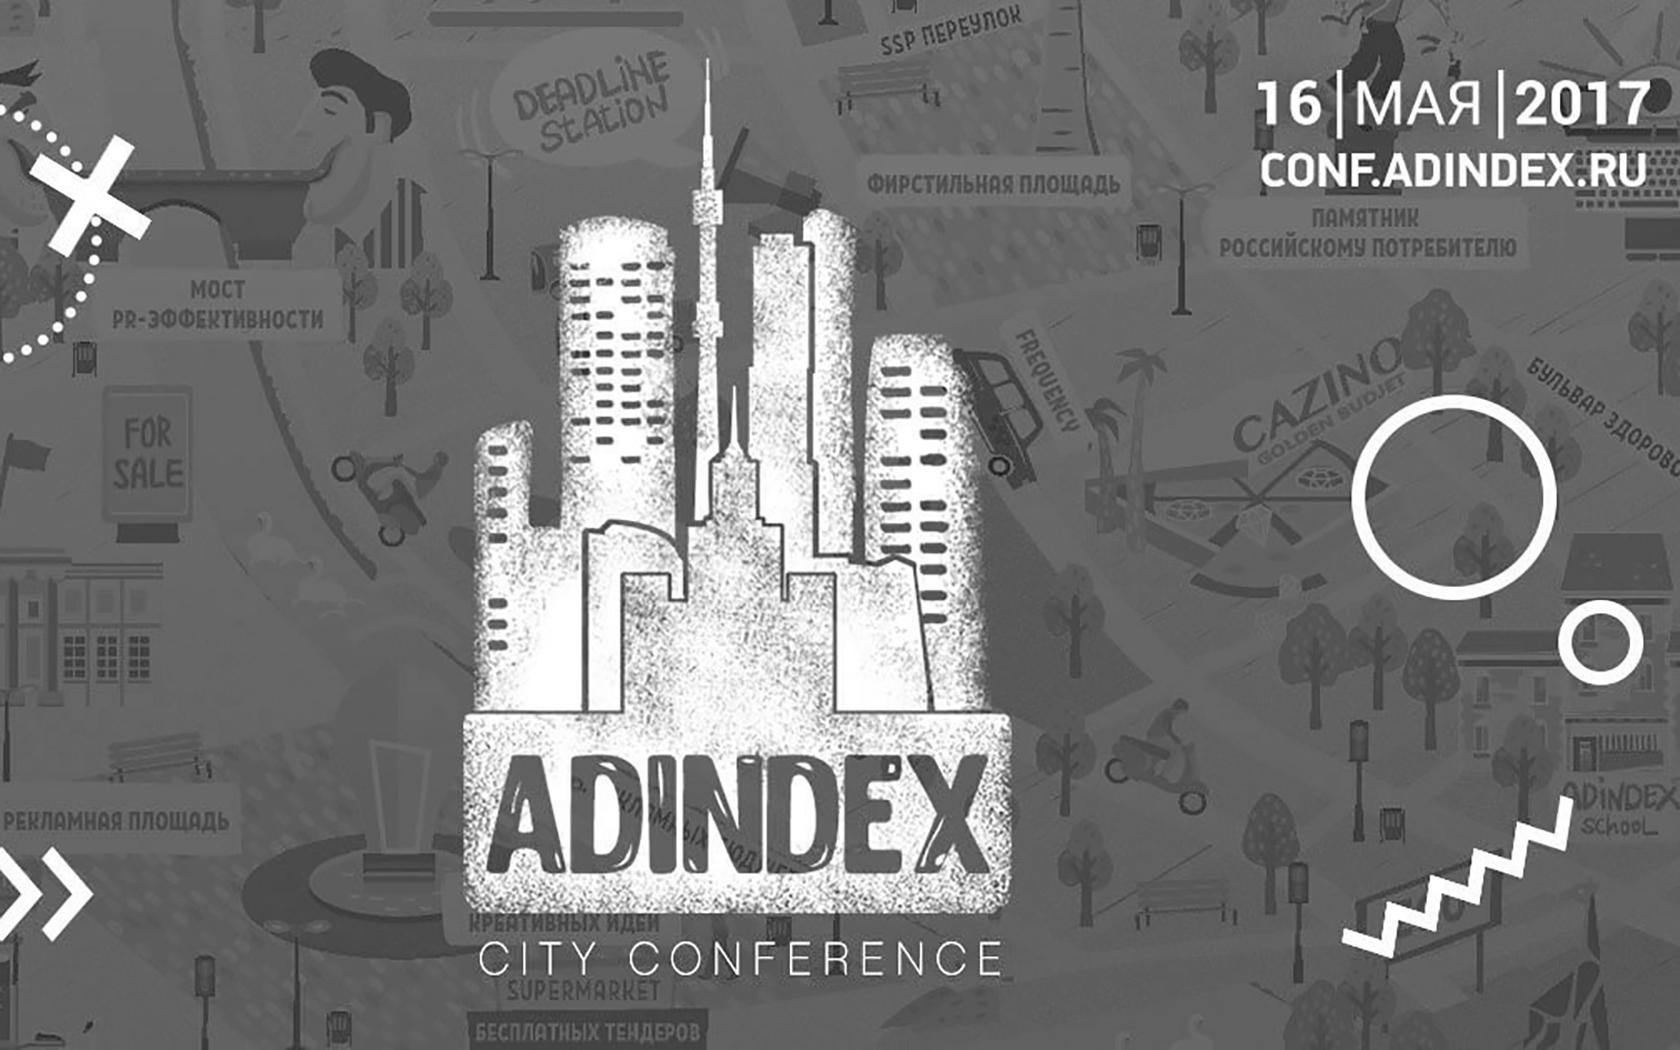 AdIndex City Conference